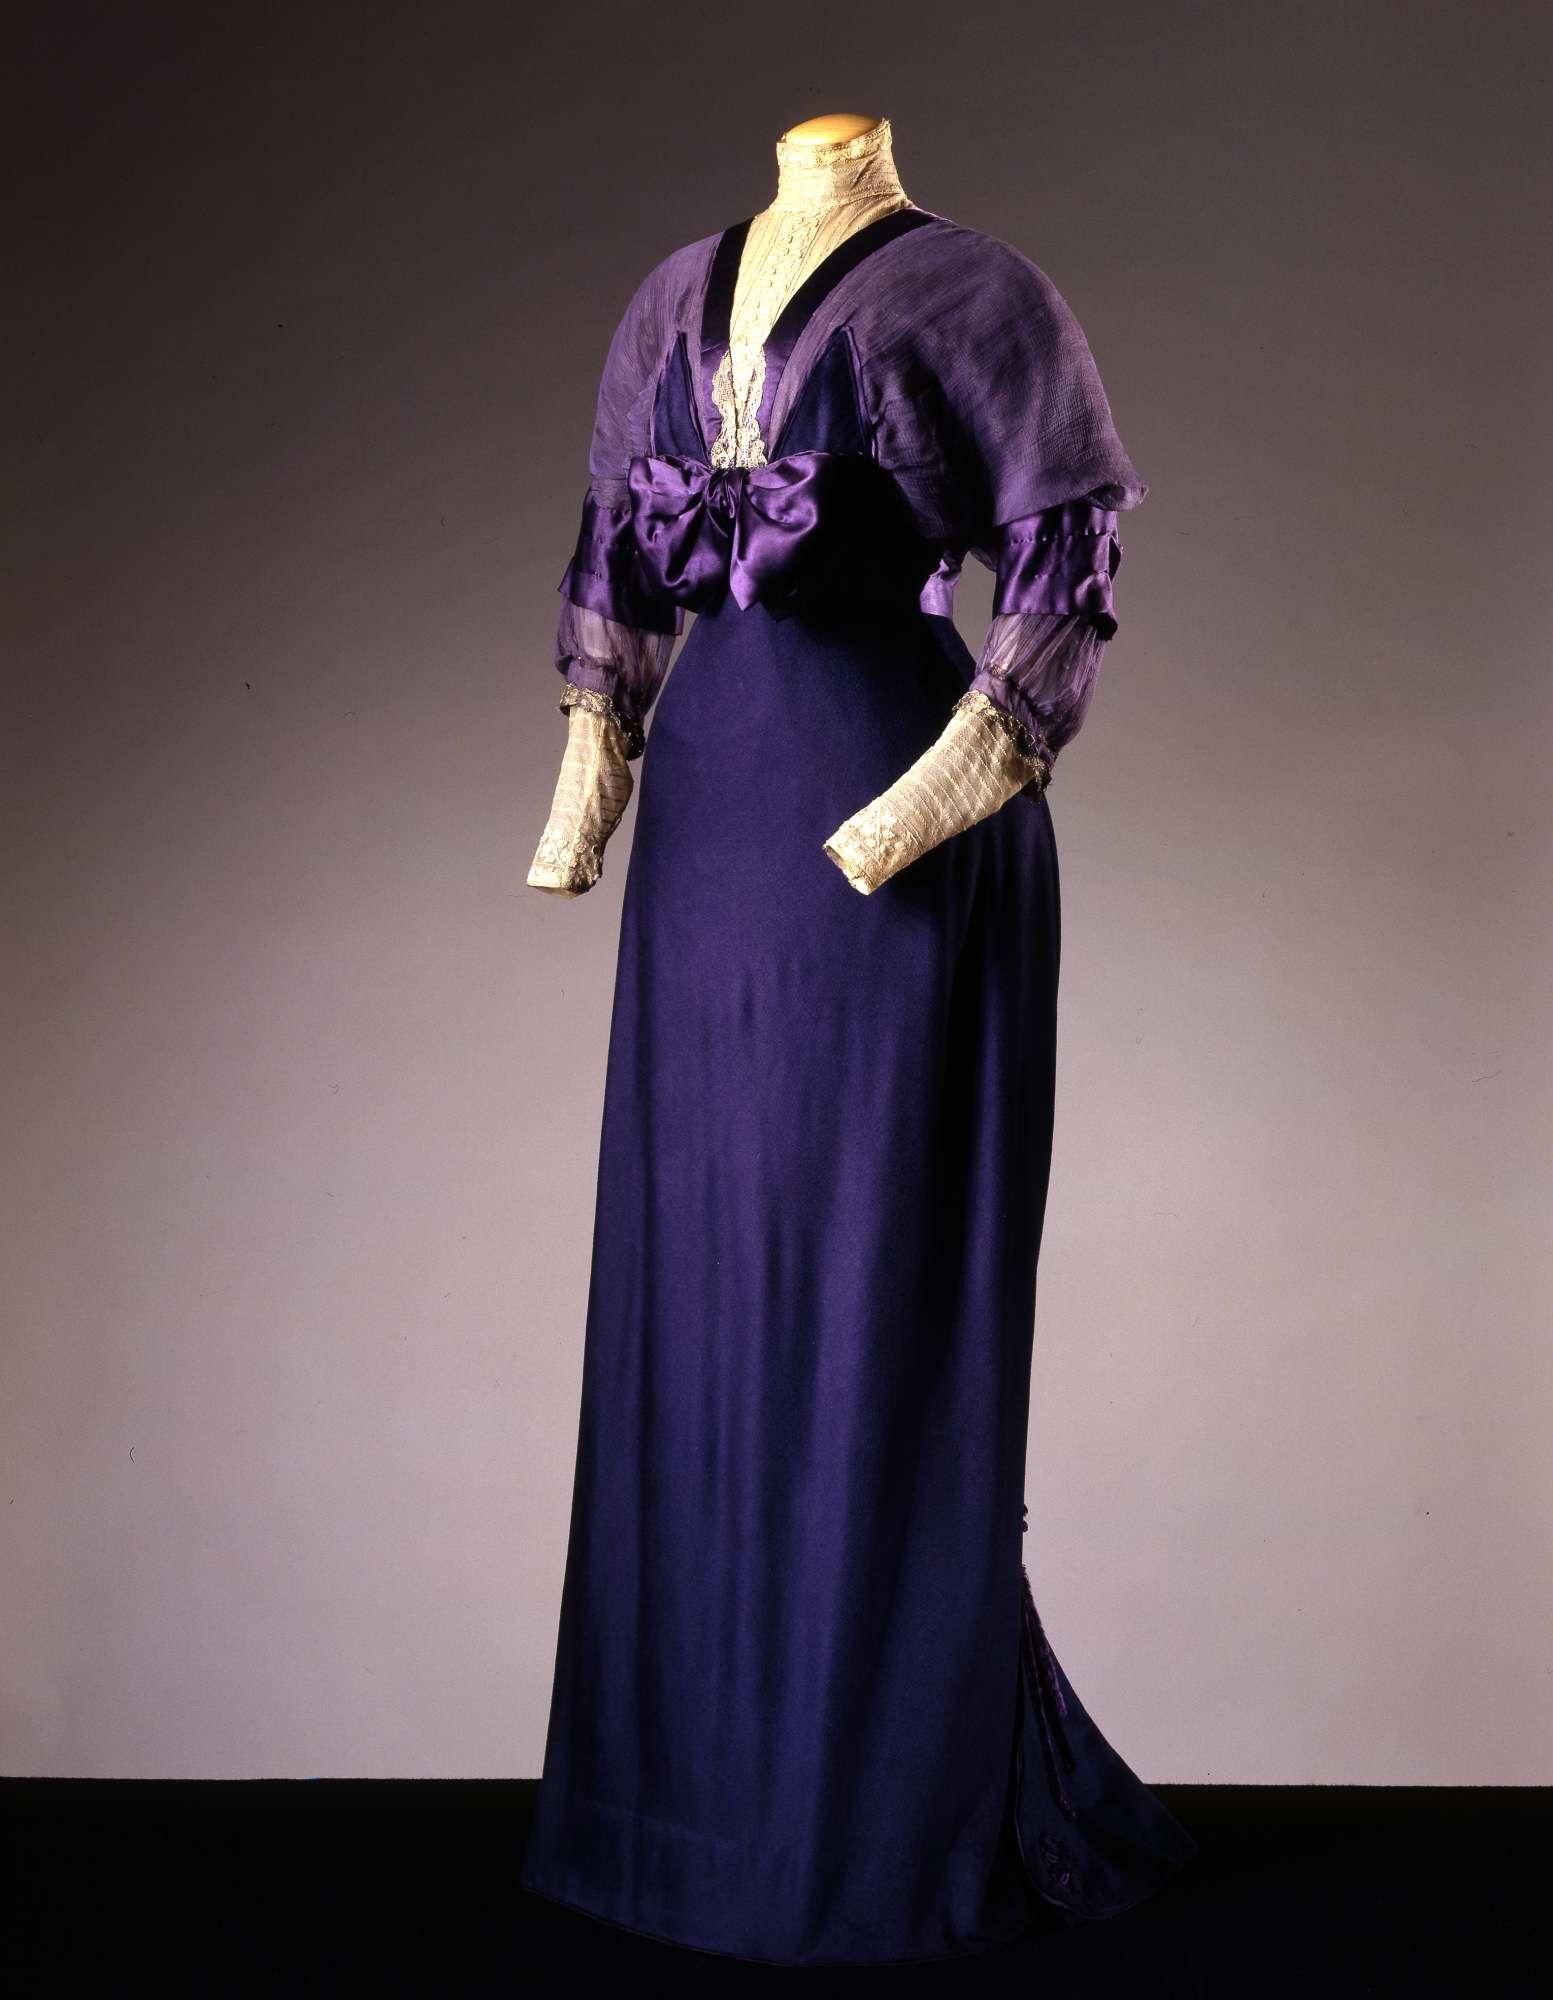 1910, France - Dress by Redfern - Chiffon, lace, satin,silk